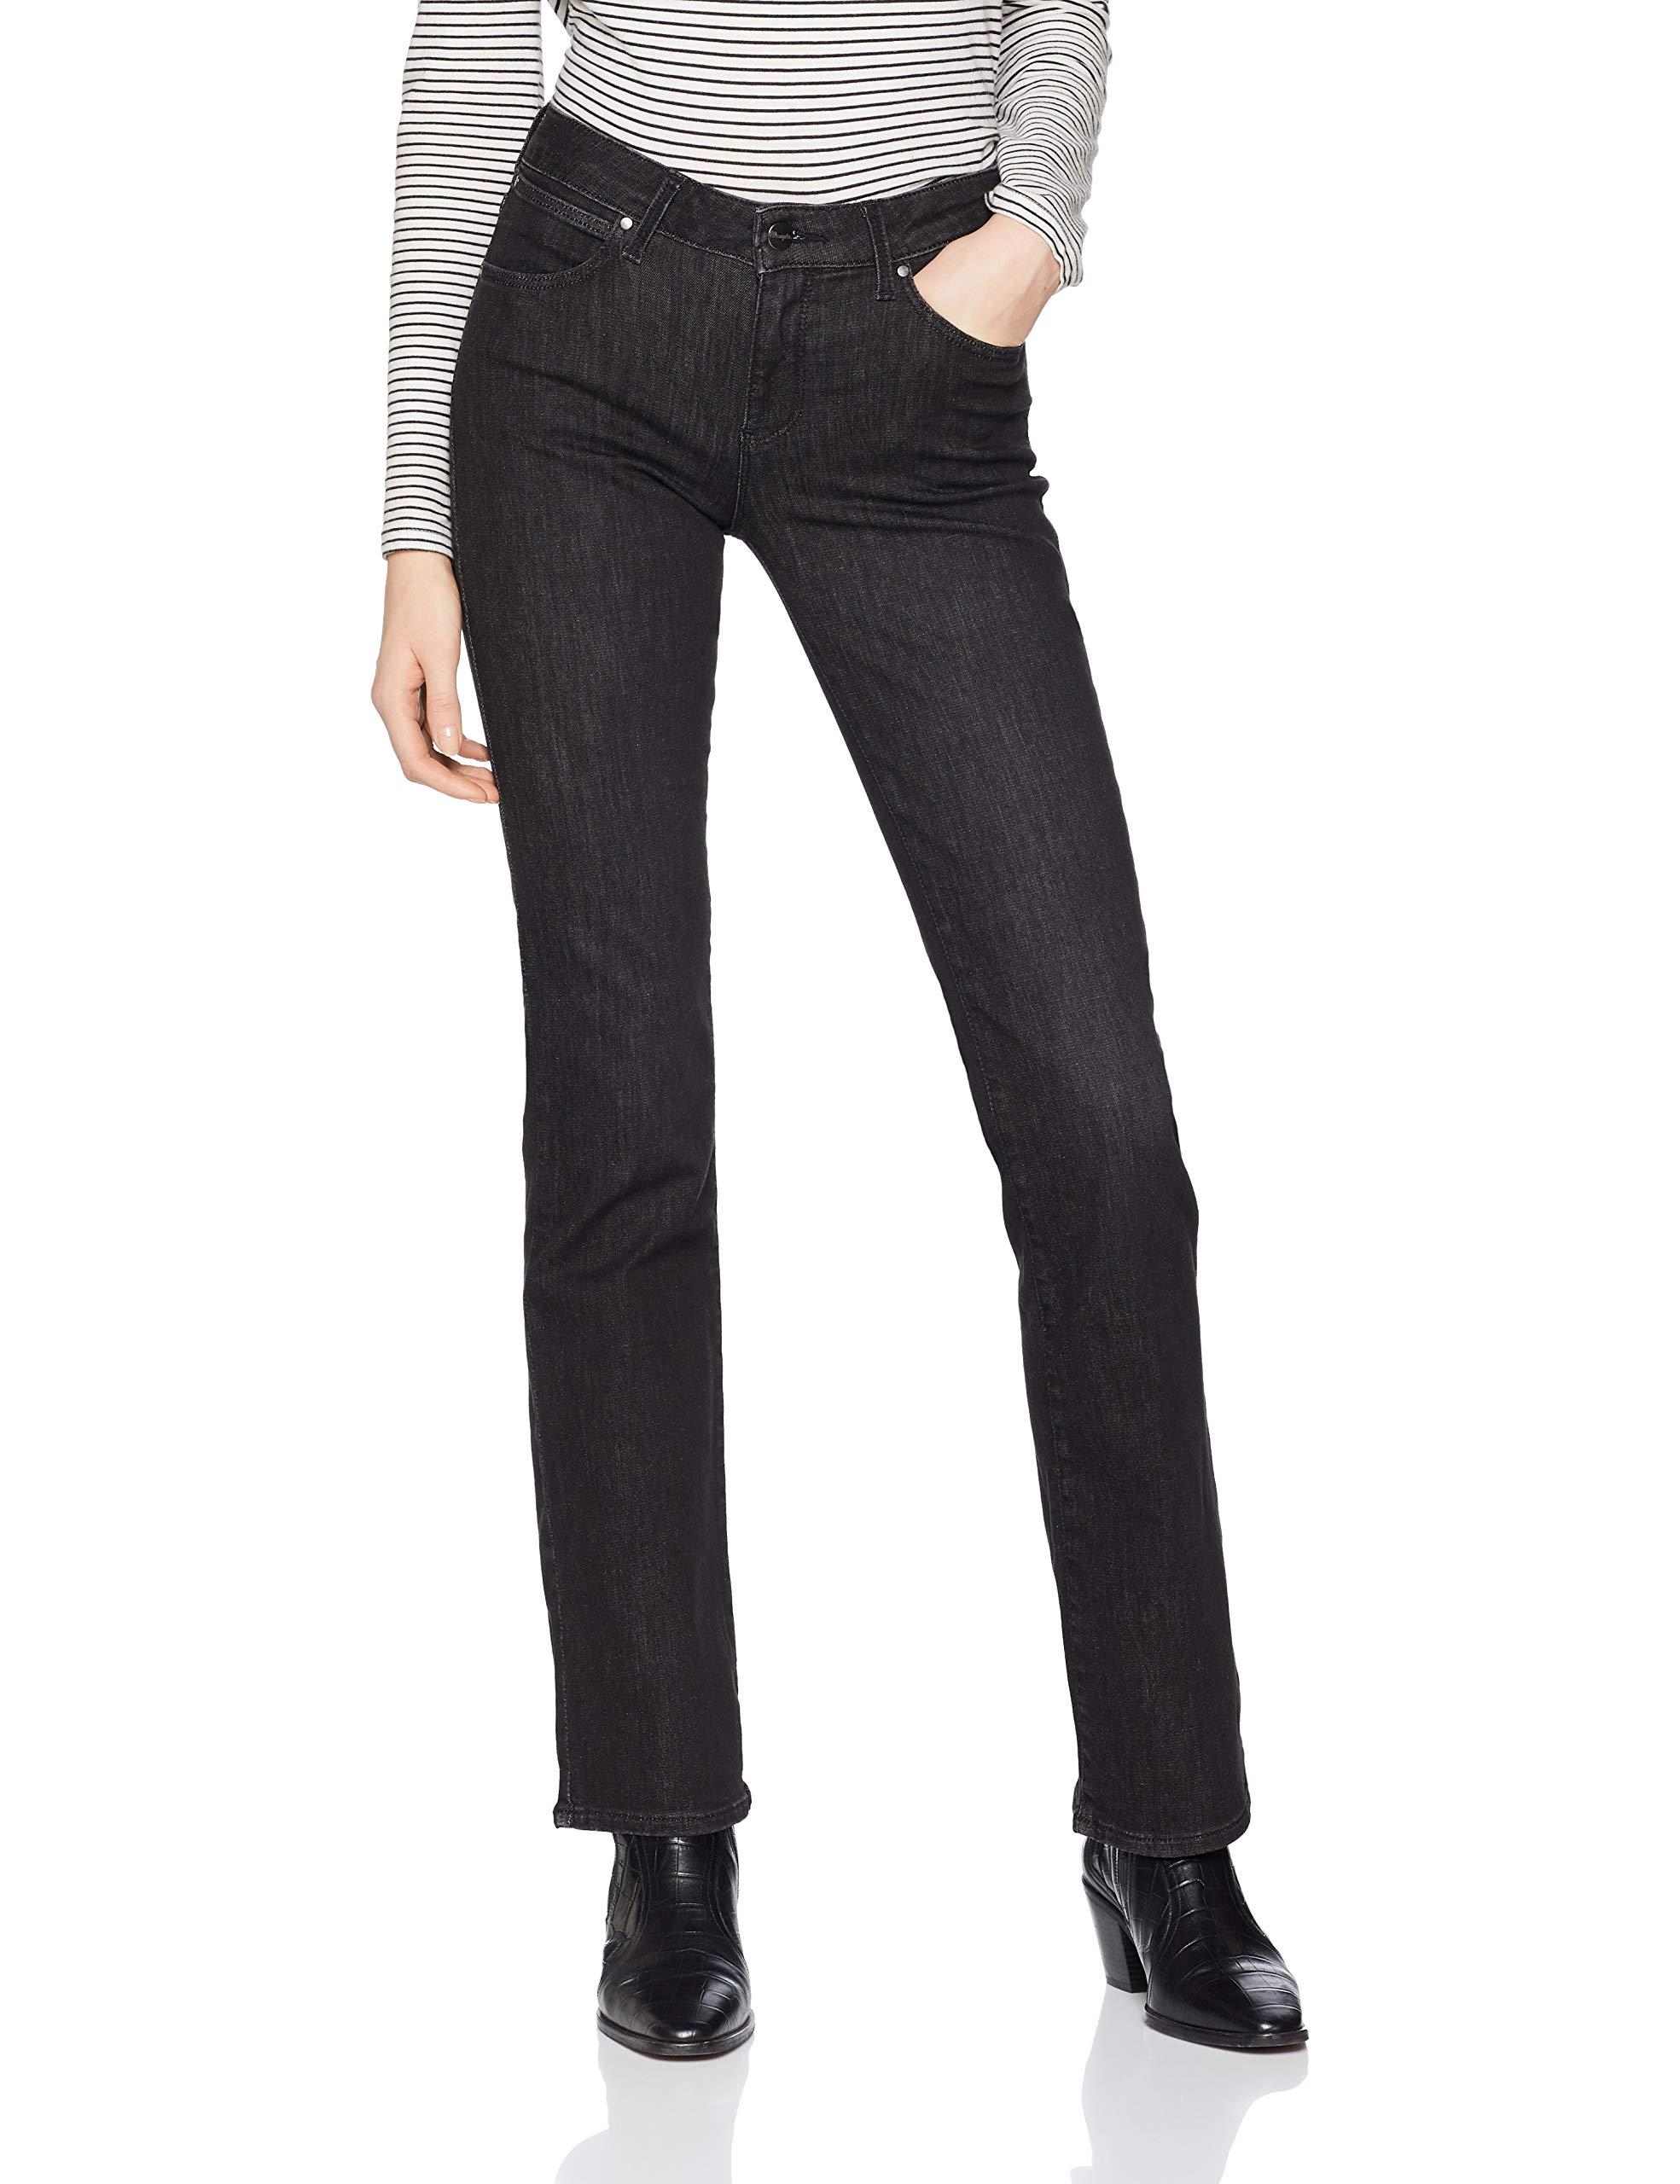 32s30w34l Bootcut' Femme Black Wrangler JeansNoirused XZOPiku